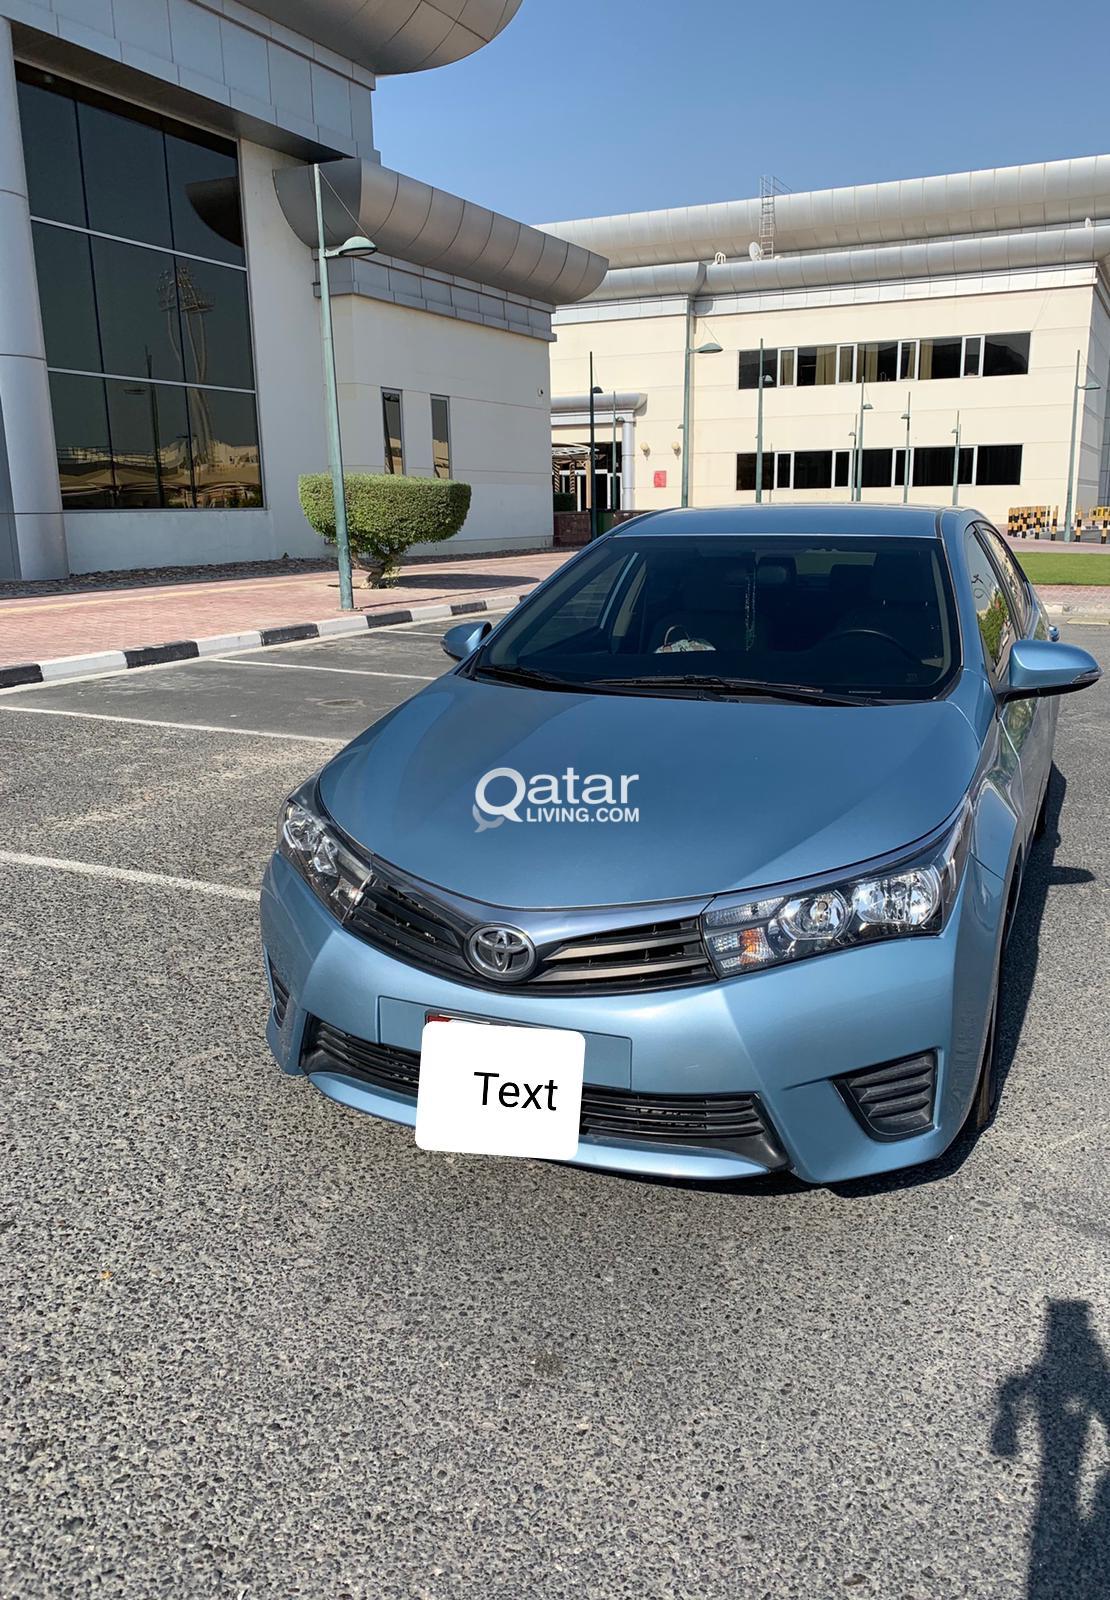 Toyota Corolla 2015XLI mid-option First owner 35km